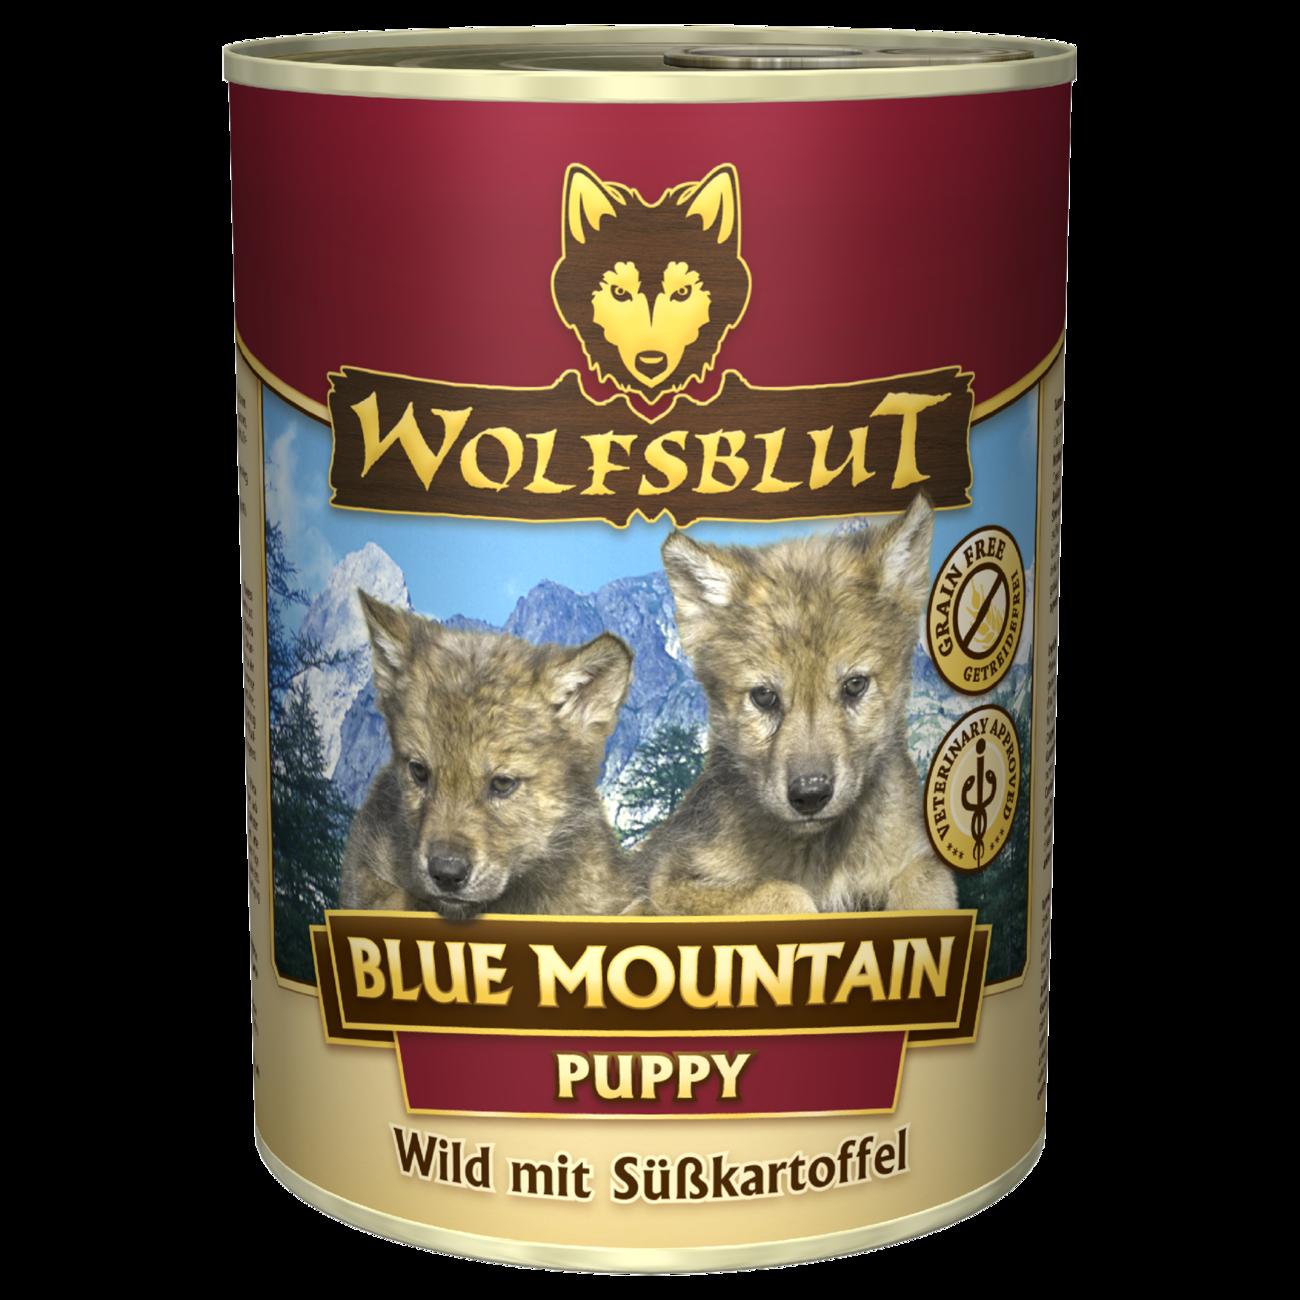 Wolfsblut Welpenfutter Dosenfutter Blue Mountain PUPPY